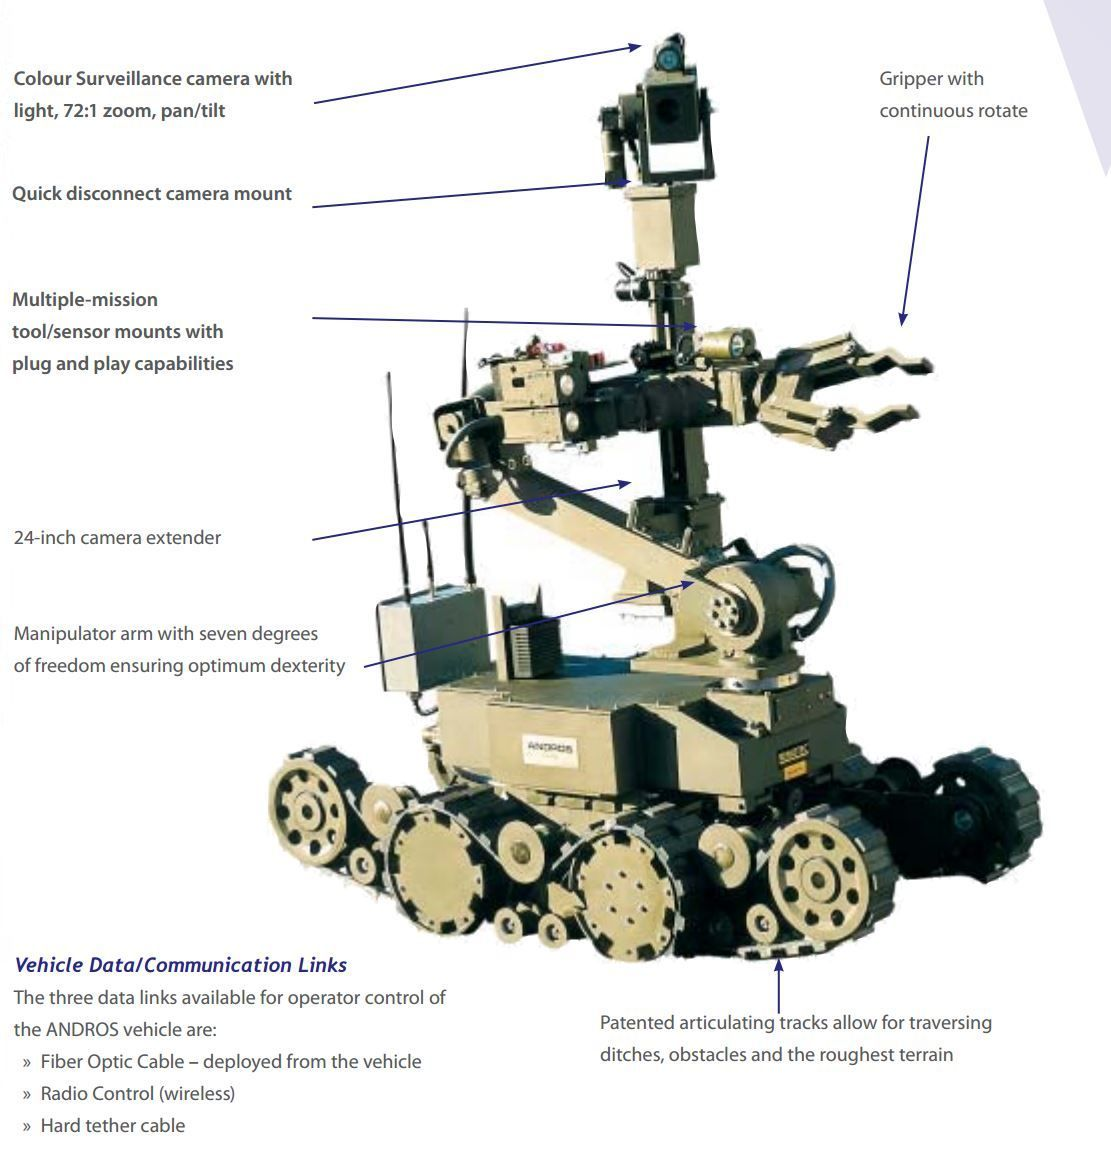 The Robotic Response